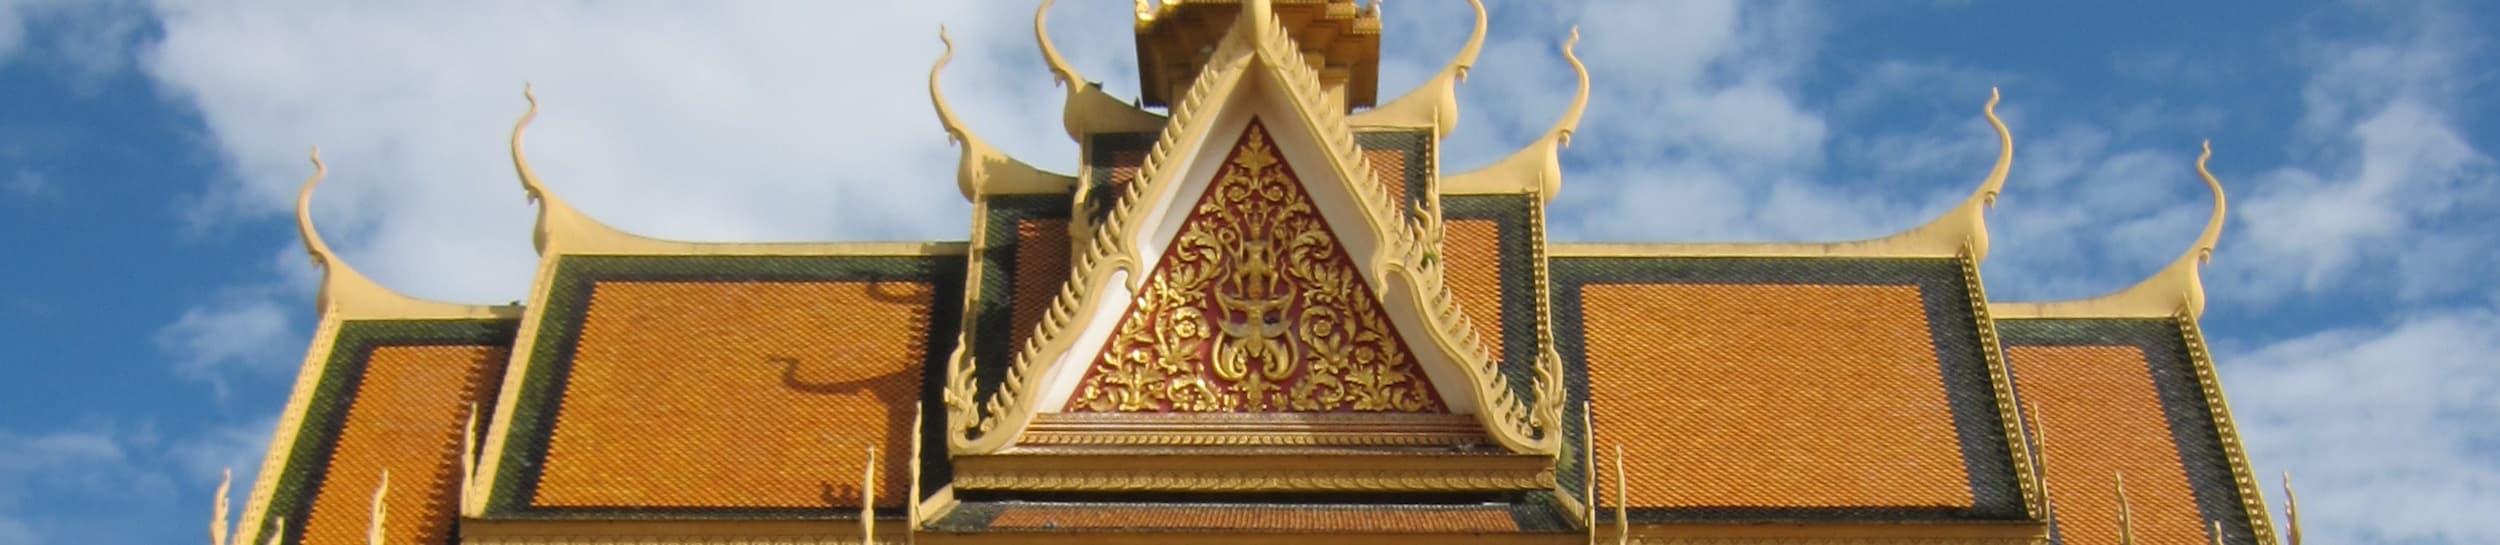 Jobs And Salaries In Phnom Penh Cambodia